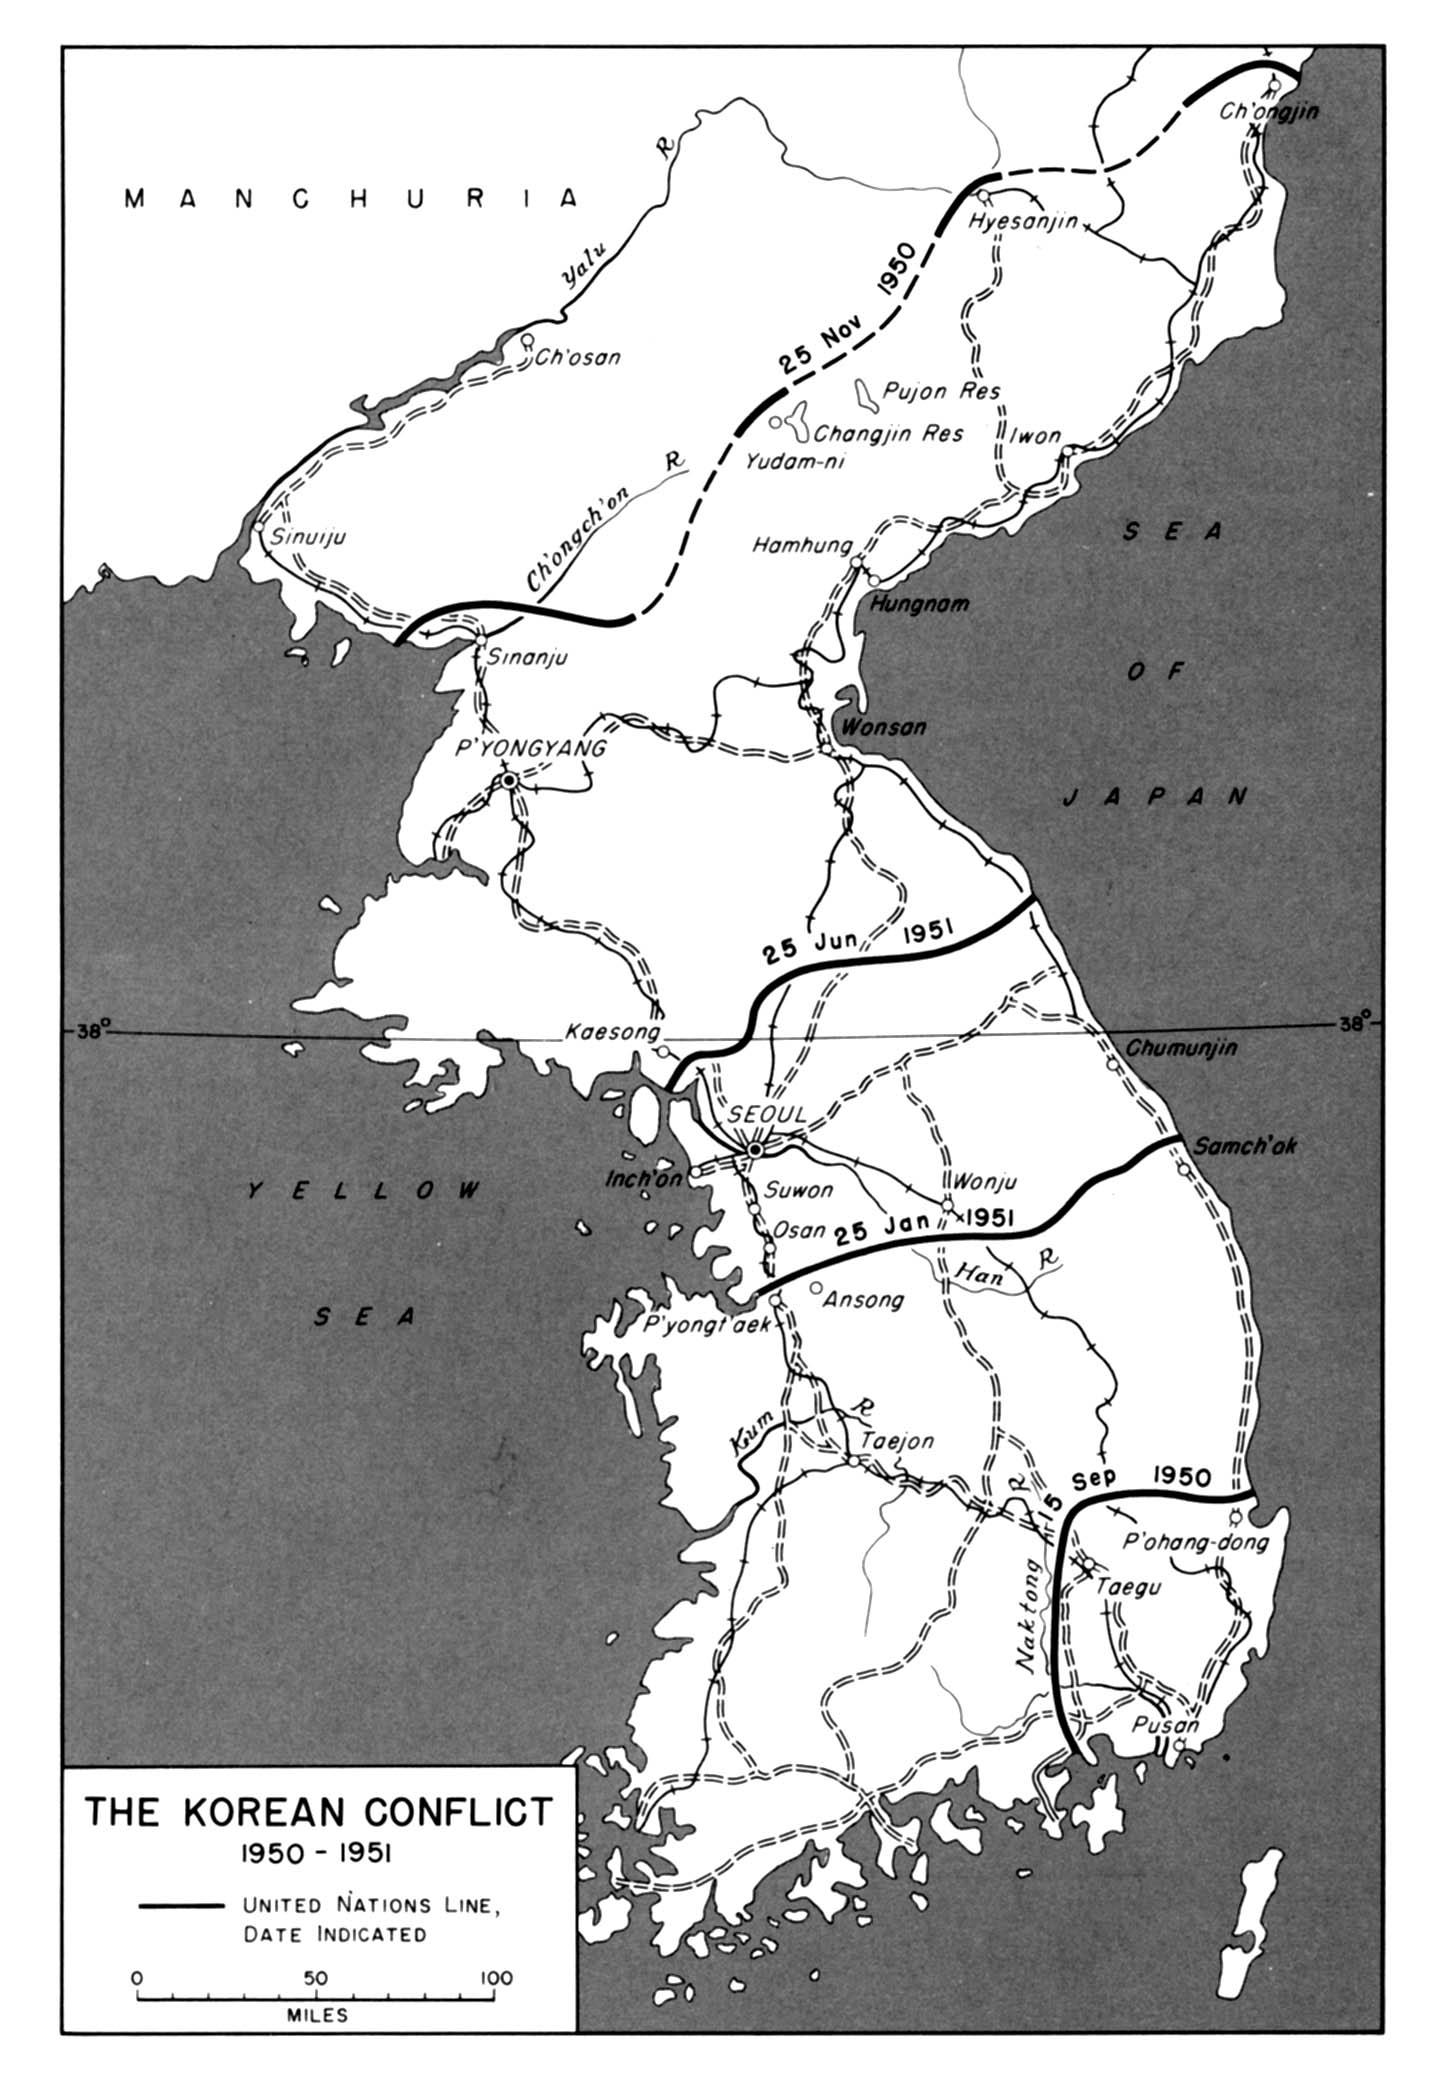 1950 1951 The Korean Conflict 1950 1951